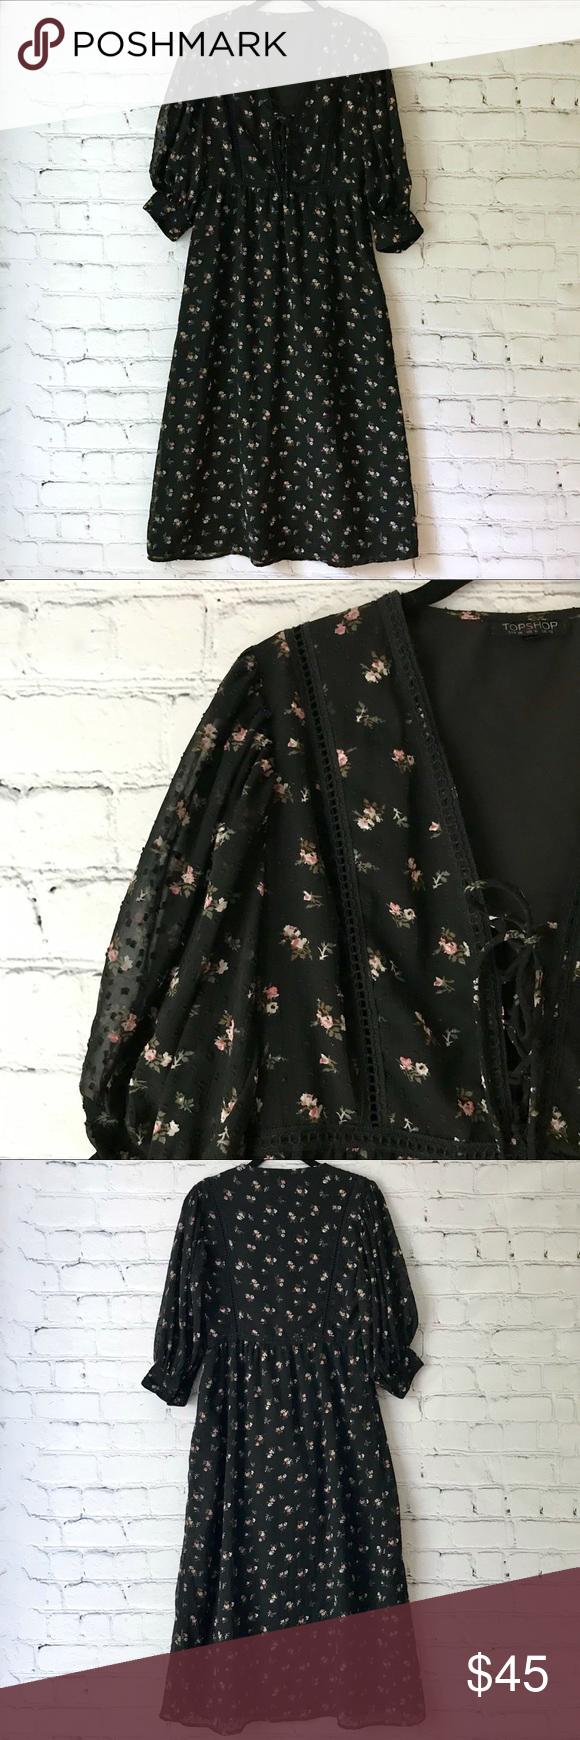 Topshop Lattice Flower Midi Dress Dot Lace Up Blck Flower Midi Dress Top Shop Dress Midi Dress [ 1740 x 580 Pixel ]